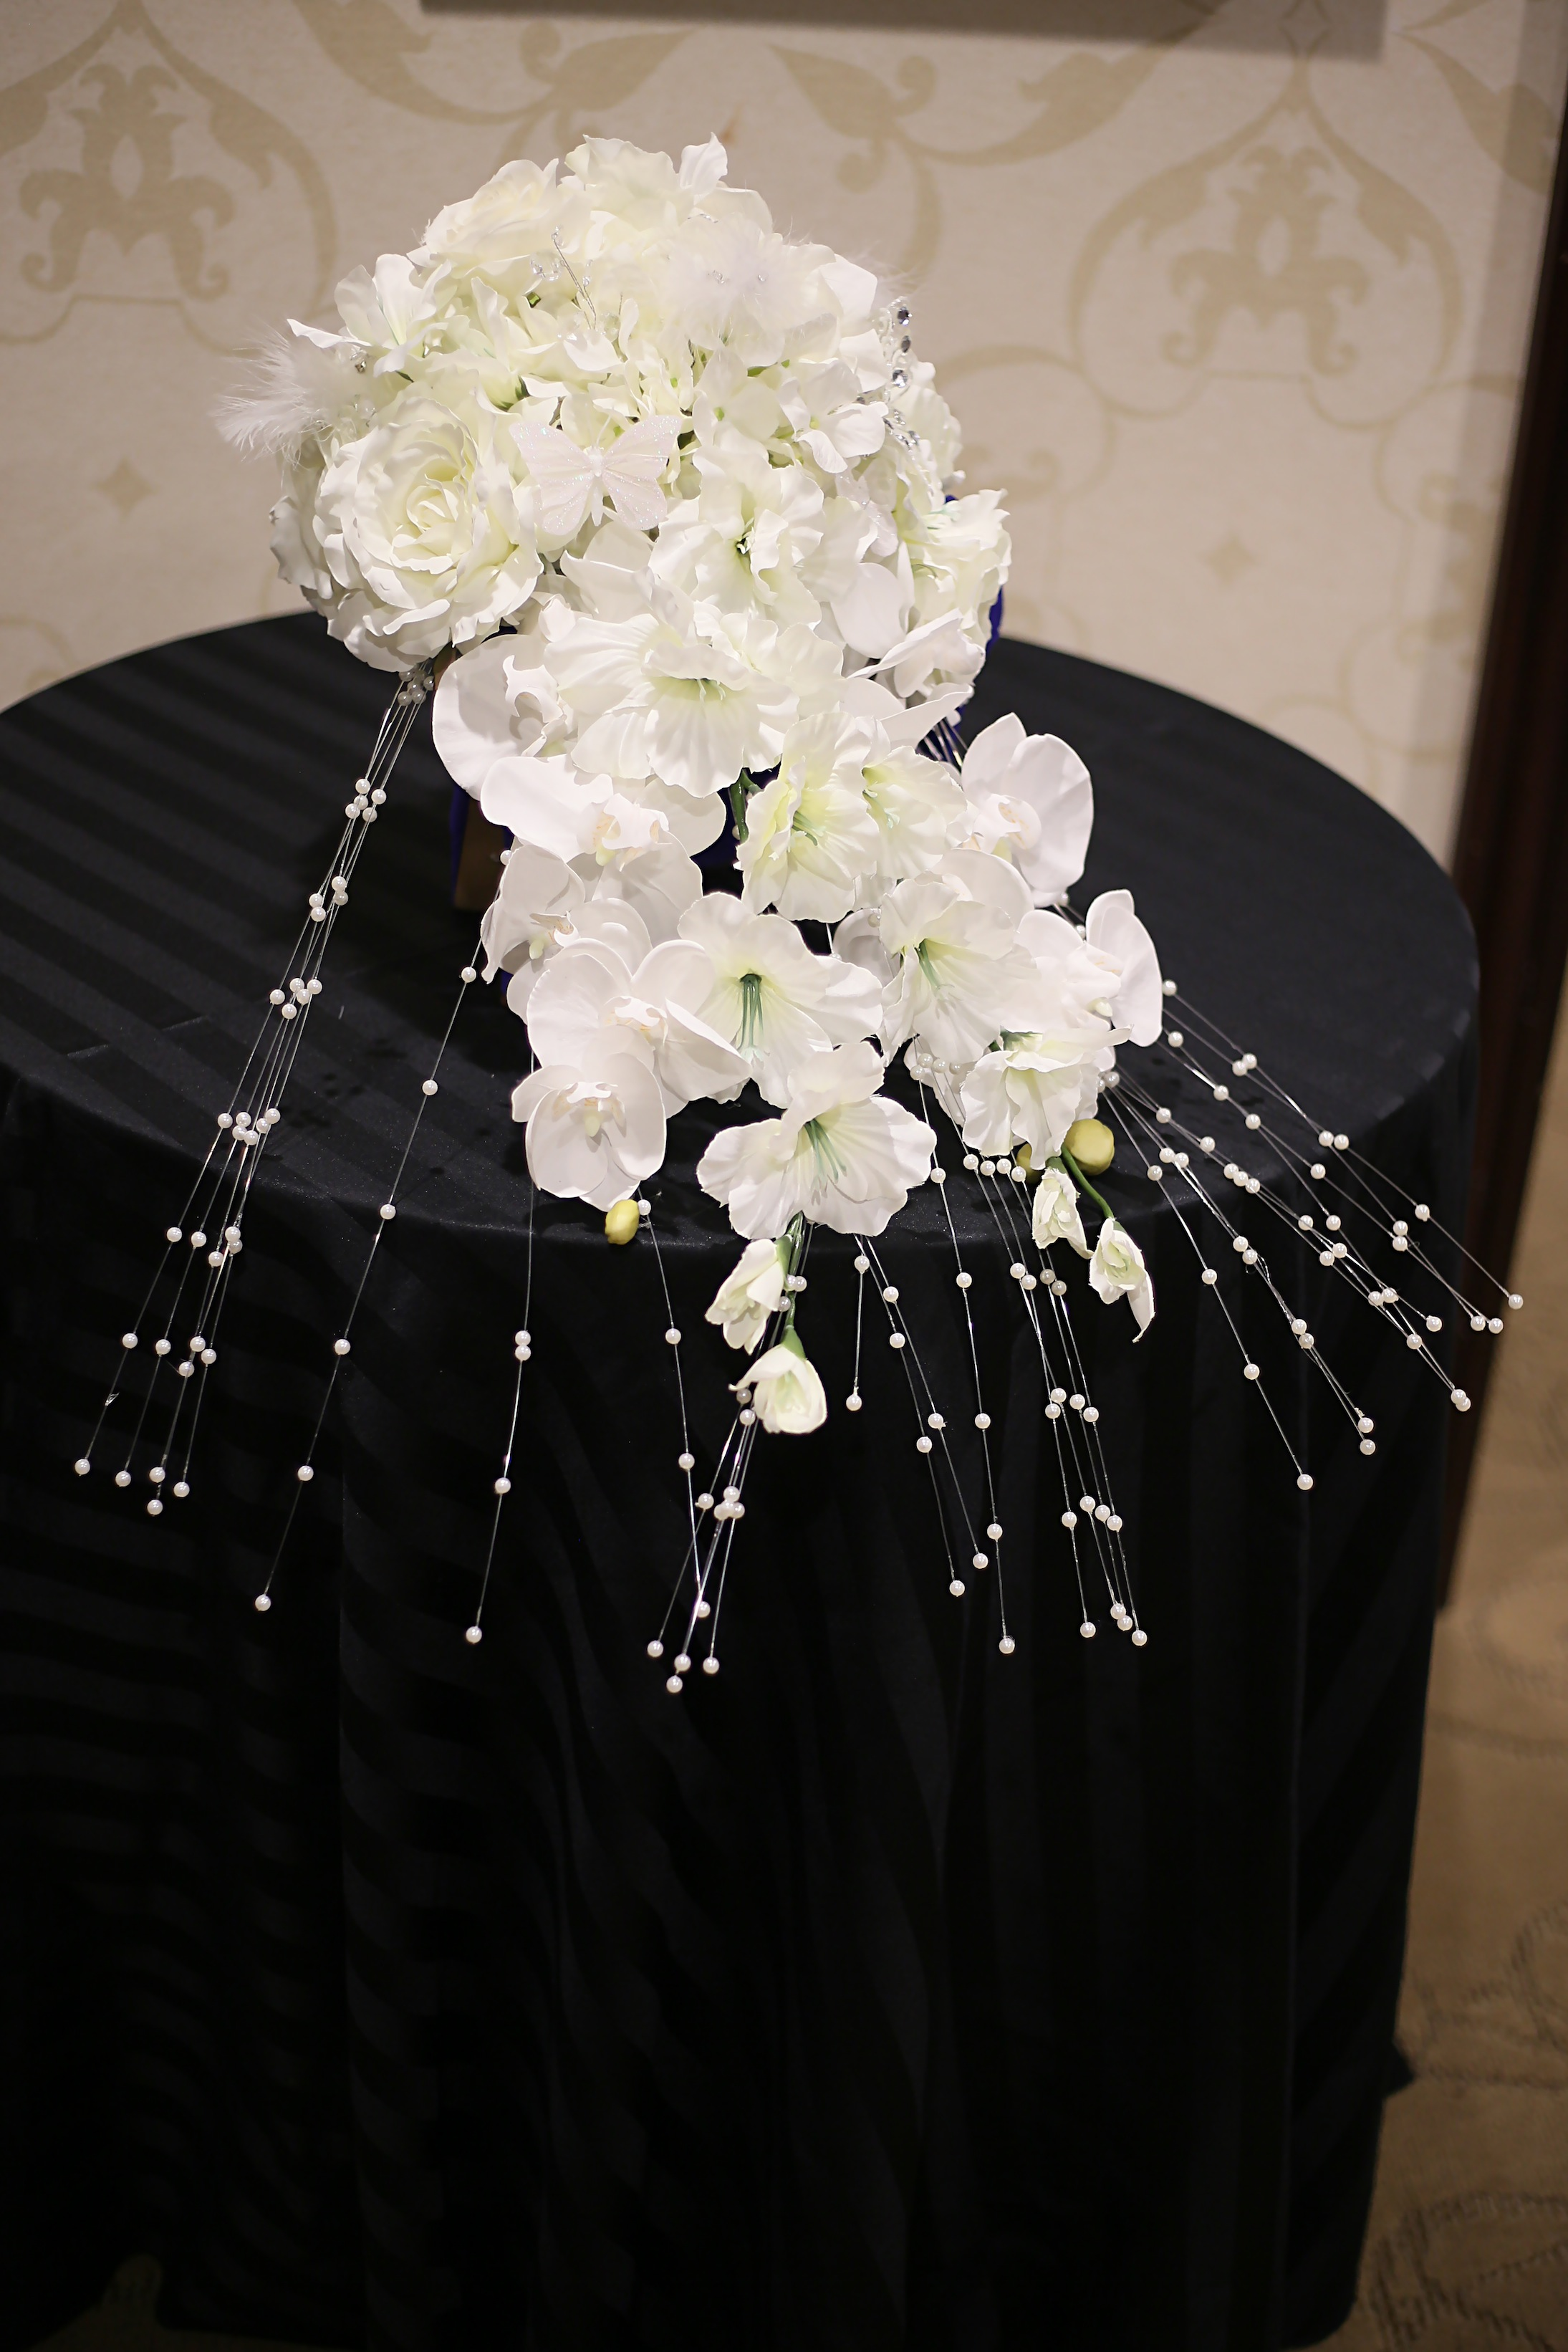 GrandMarquisWedding, njweddingphotos, njweddingphotography, njweddingphotographer, oldbridgephotographer, apicturesquememoryphotography, wedding, weddinginspiration, bridesbouquet